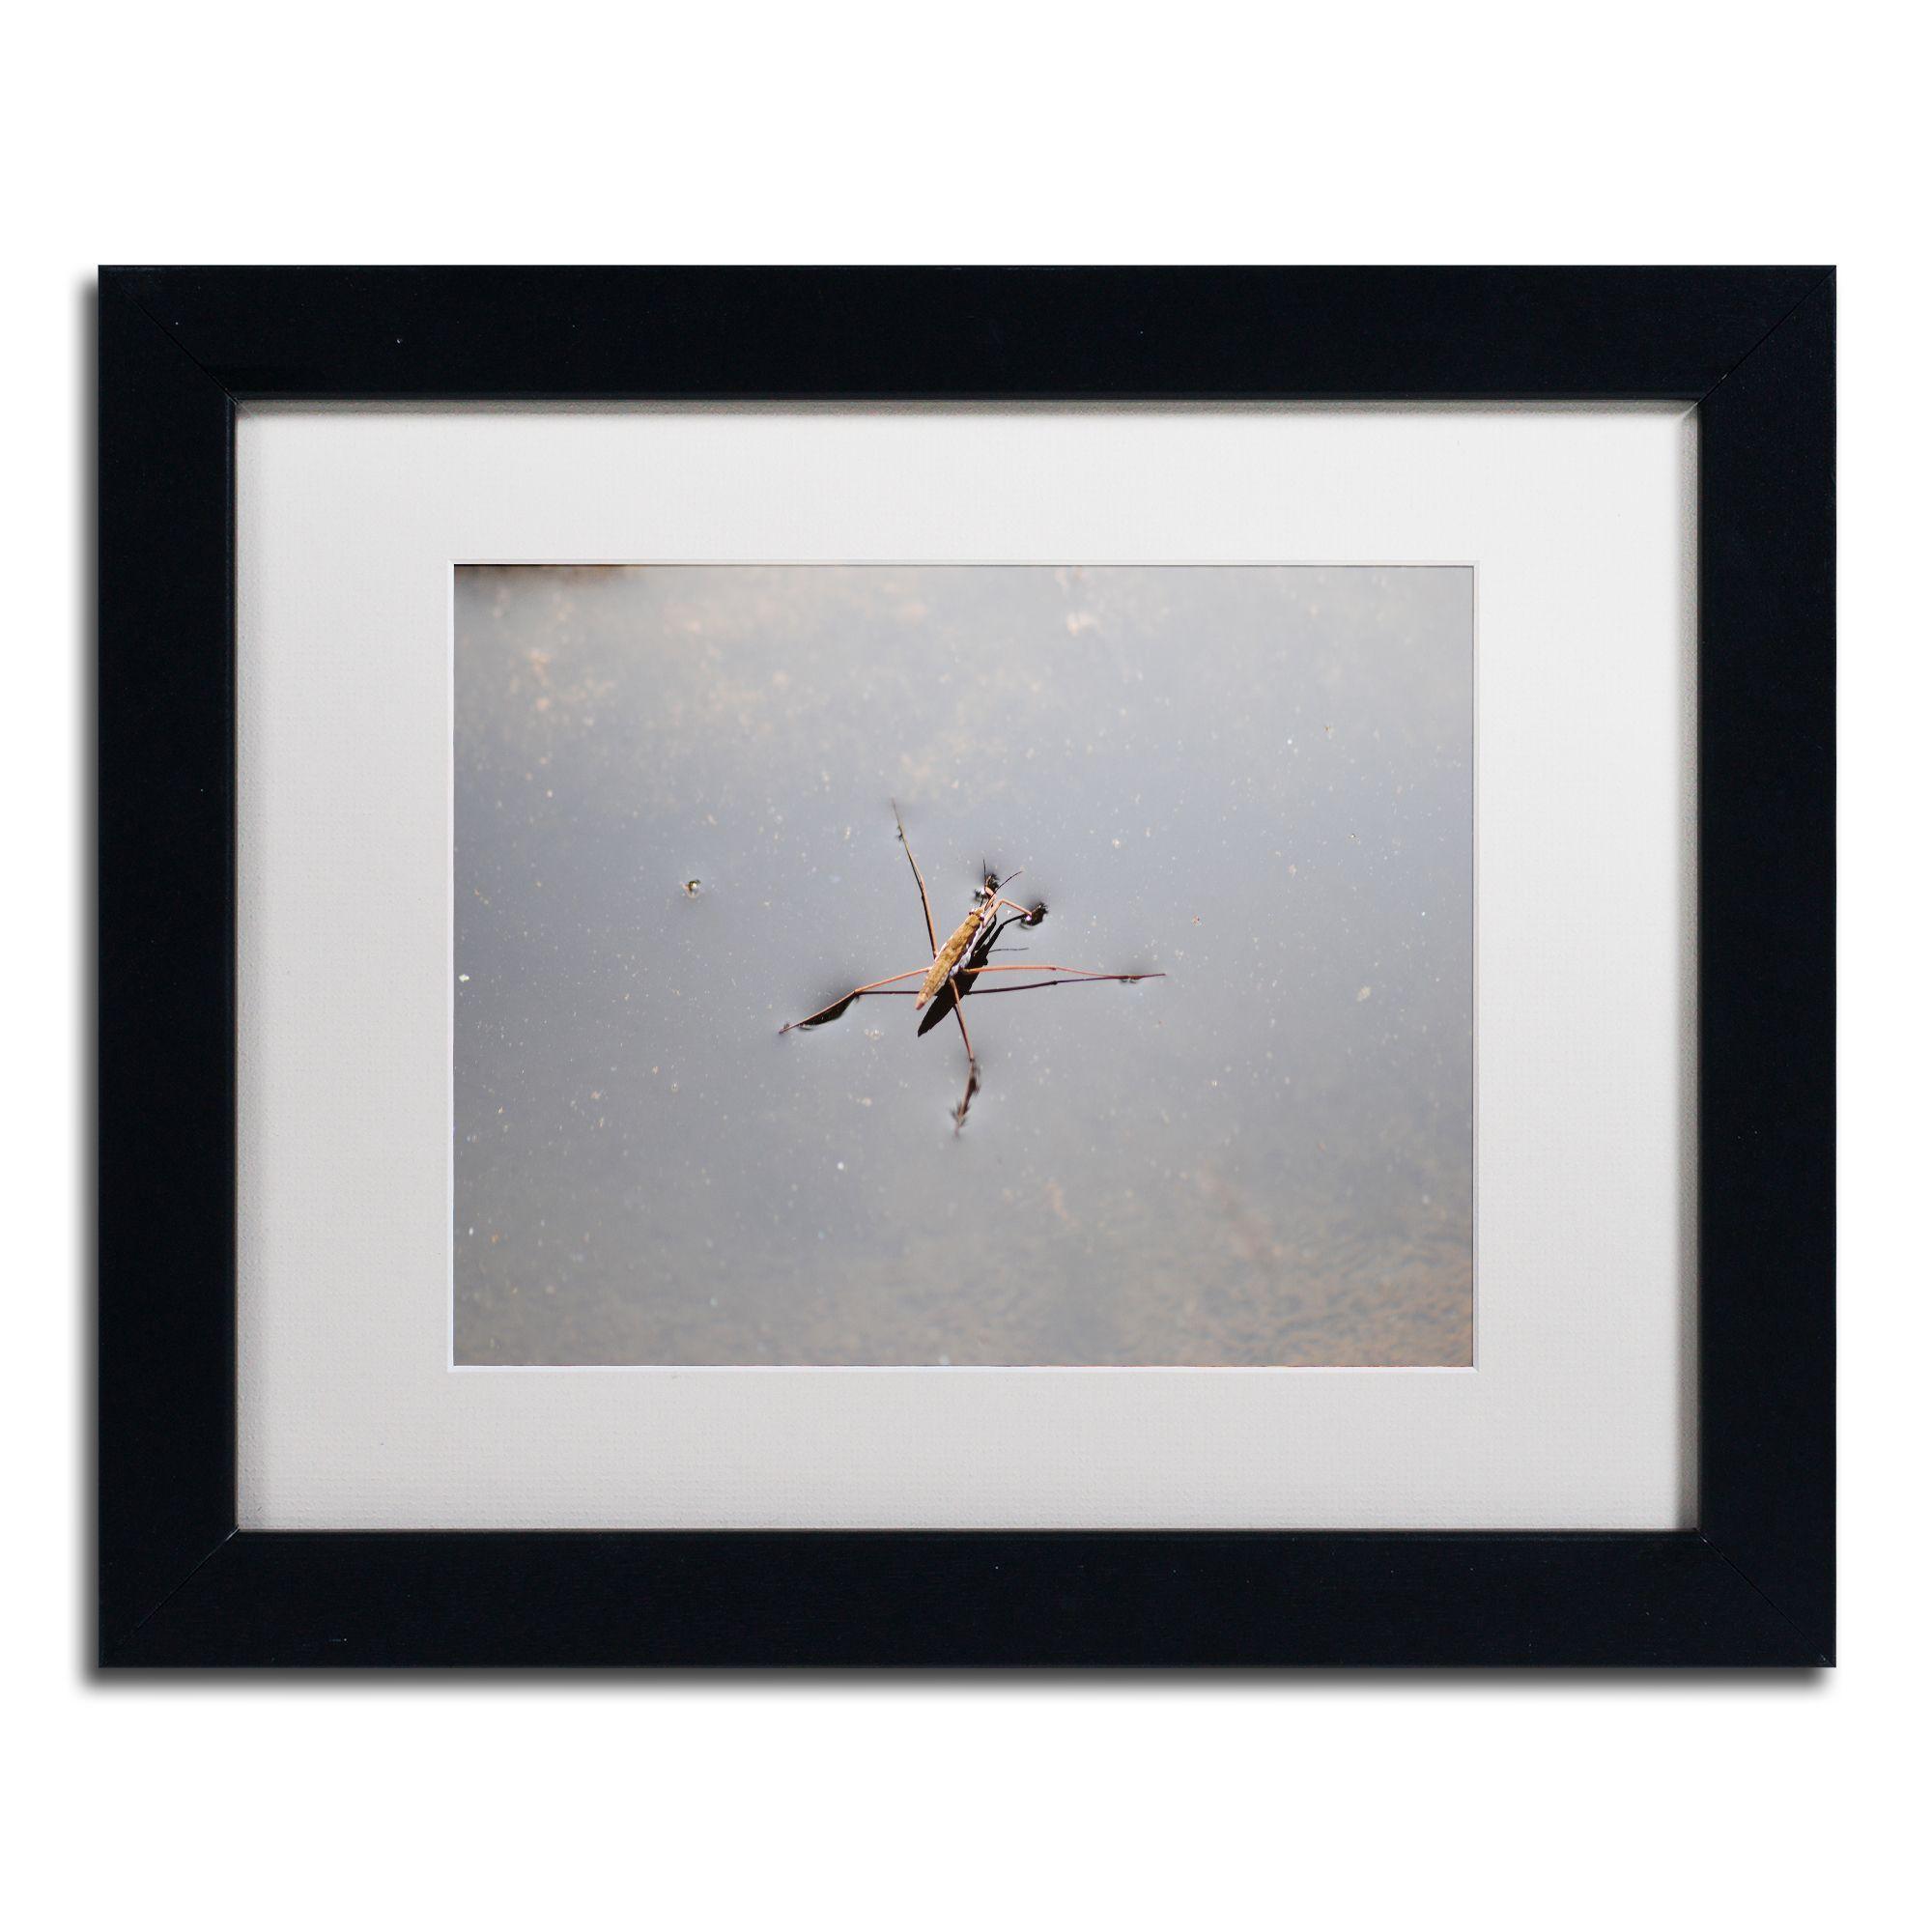 Monica Mize 'Glide' White Matte, Framed Wall Art